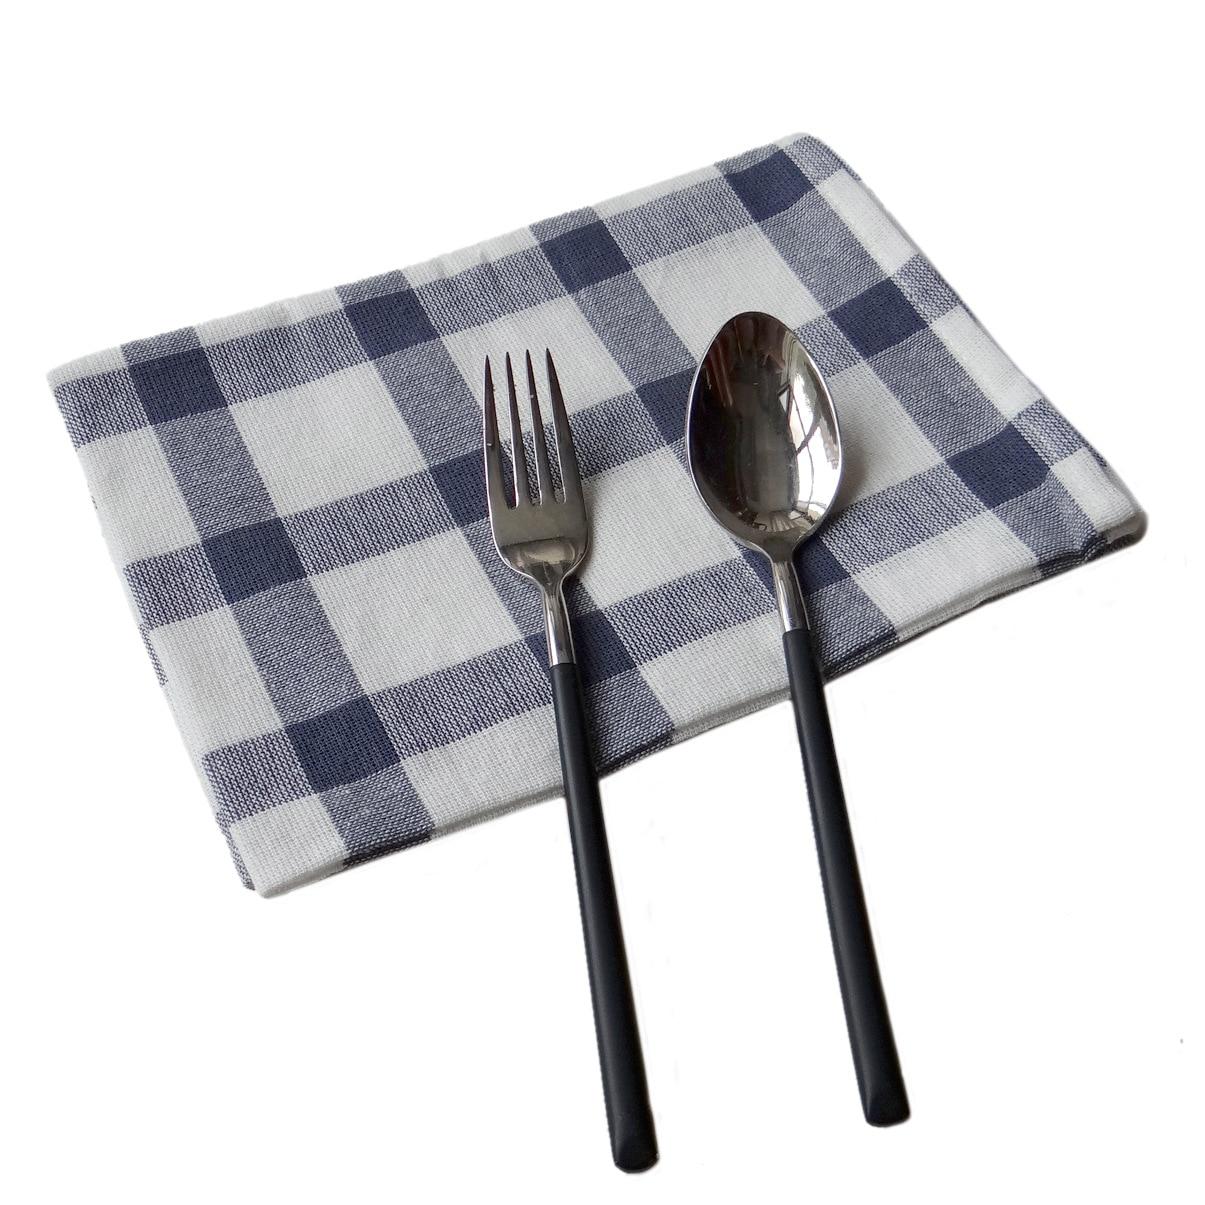 5pcs/lot Cotton Stripe Grid Table Napkins Home Kitchen Tea Towel Absorbent Dish Cleaning Towels